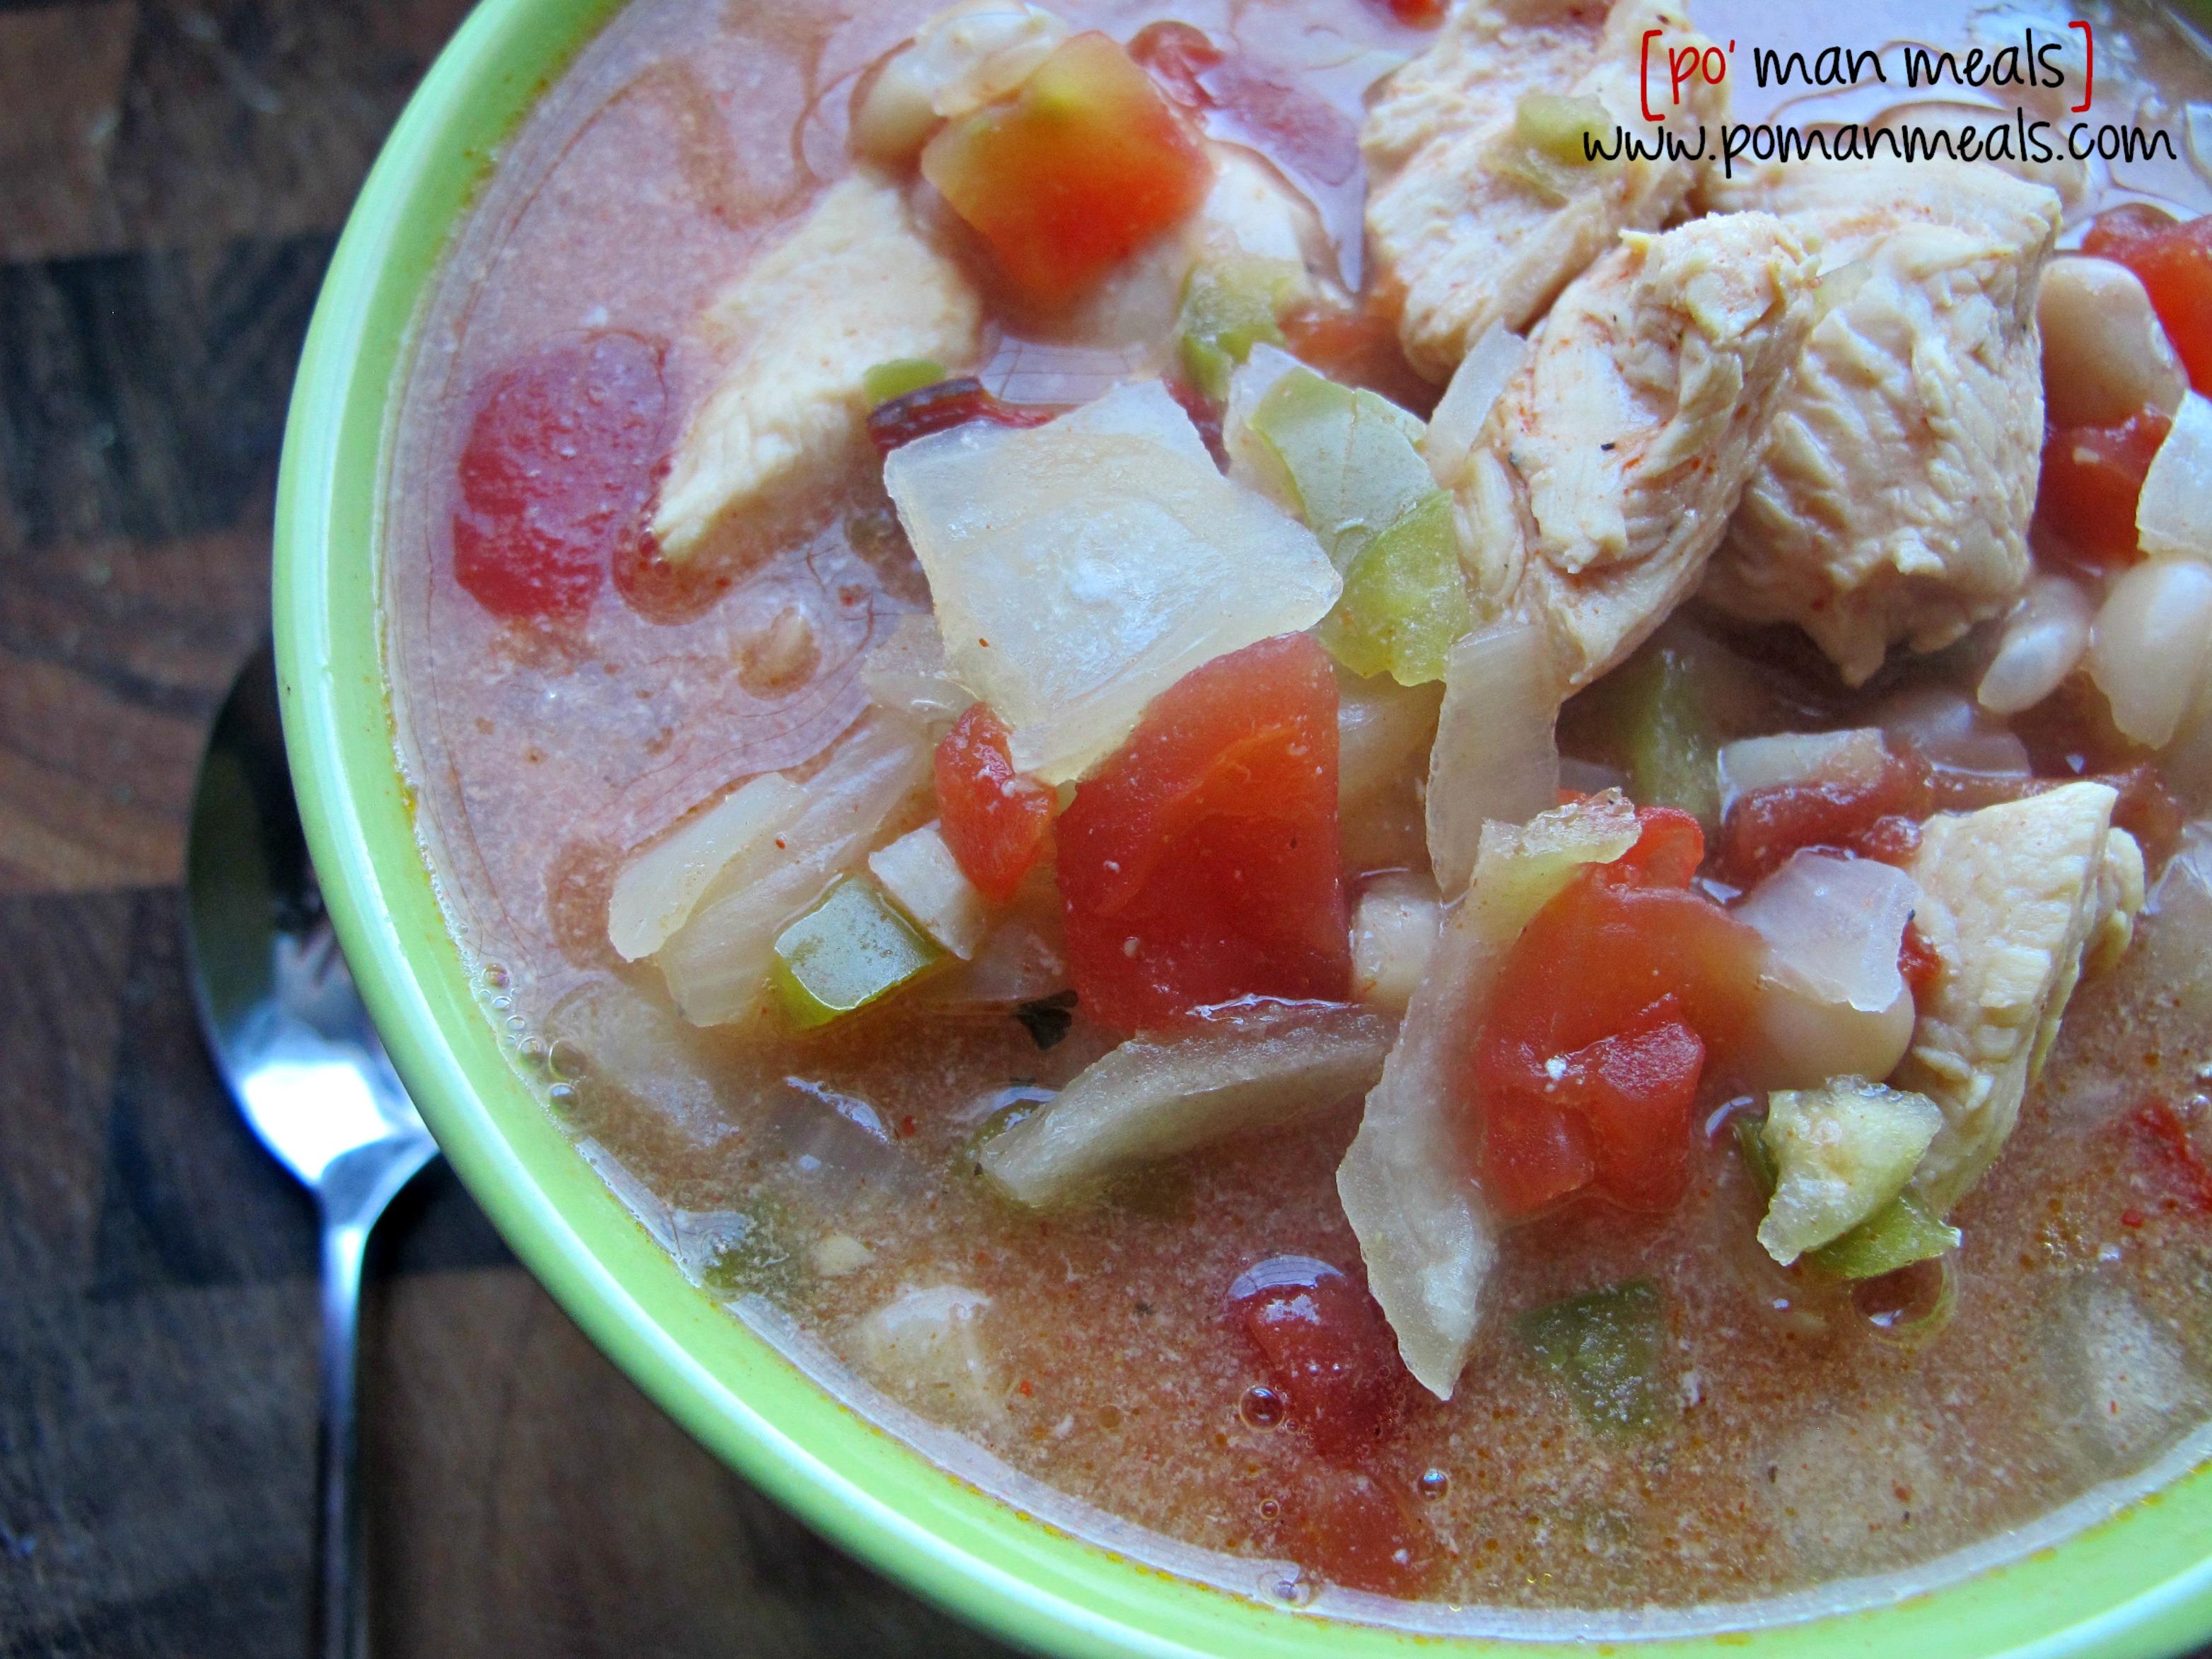 po' man meals - 2 teaspoons paprika